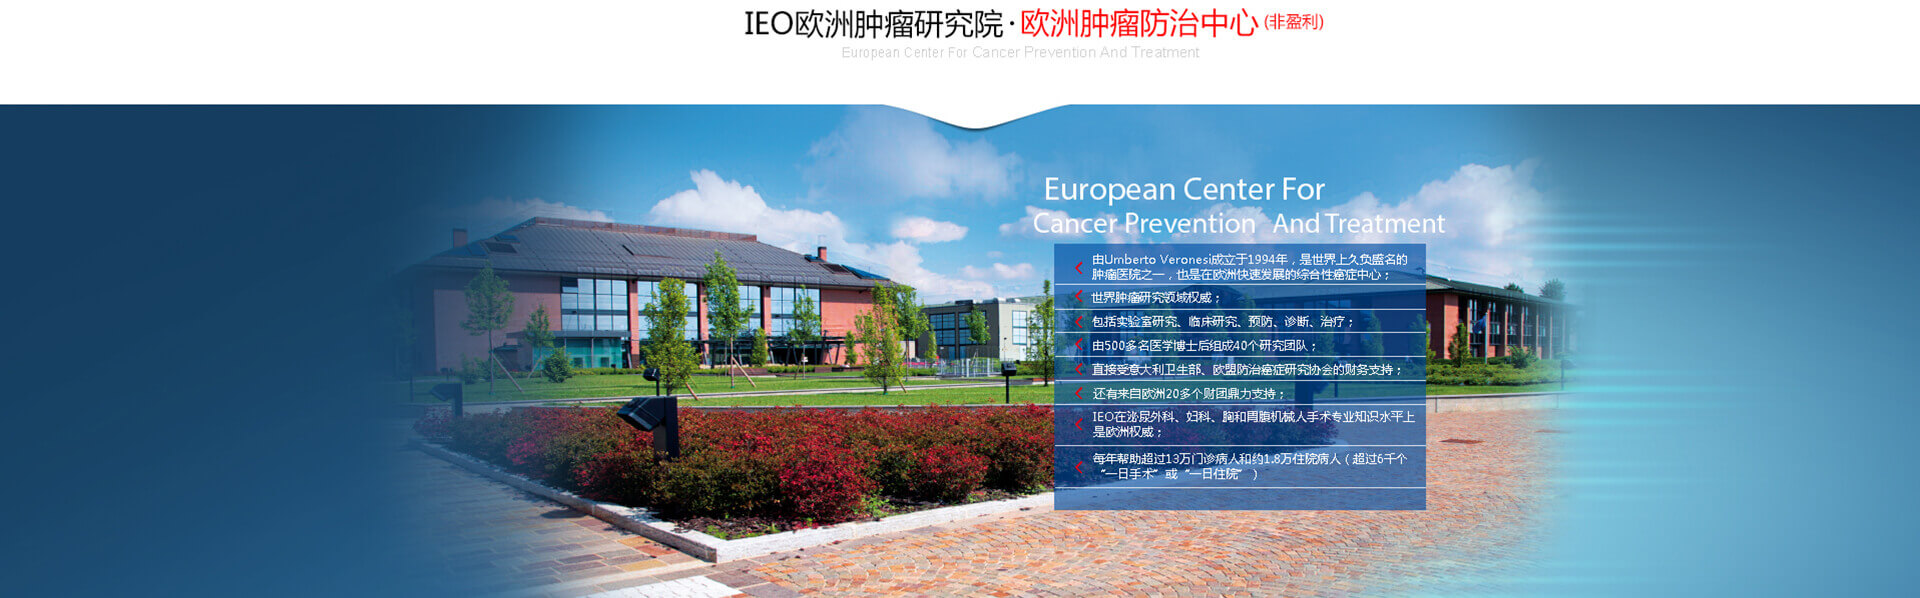 IEO欧洲肿瘤研究院